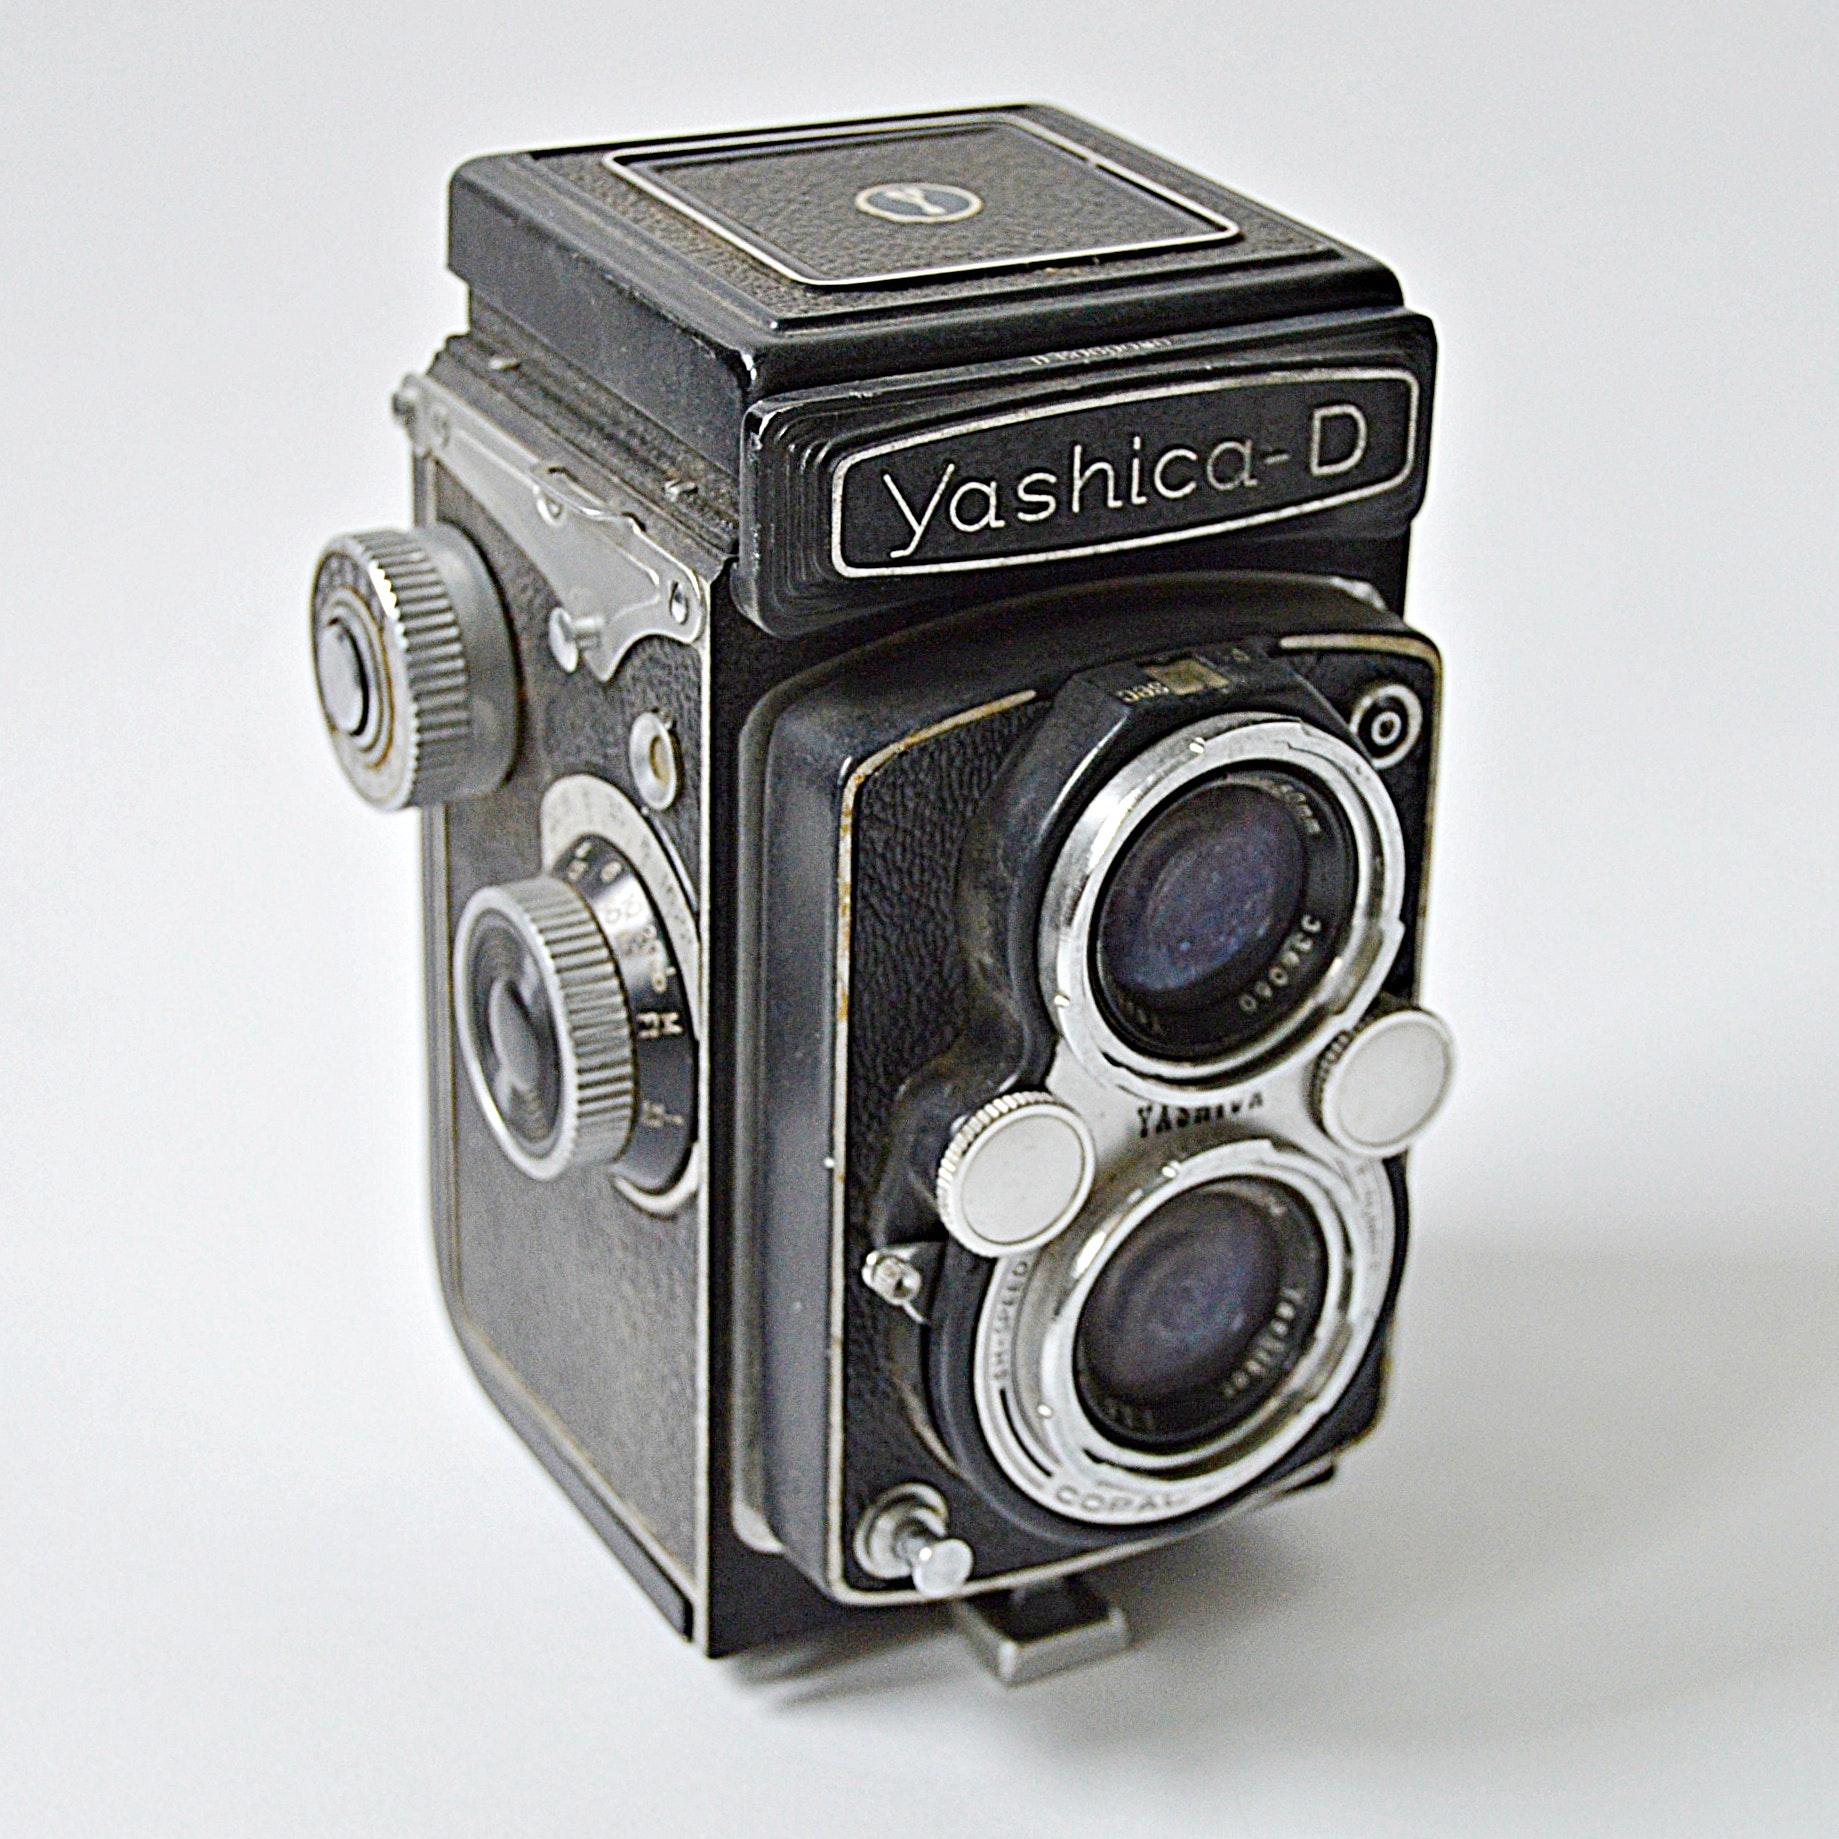 Vintage Yashica-D Camera